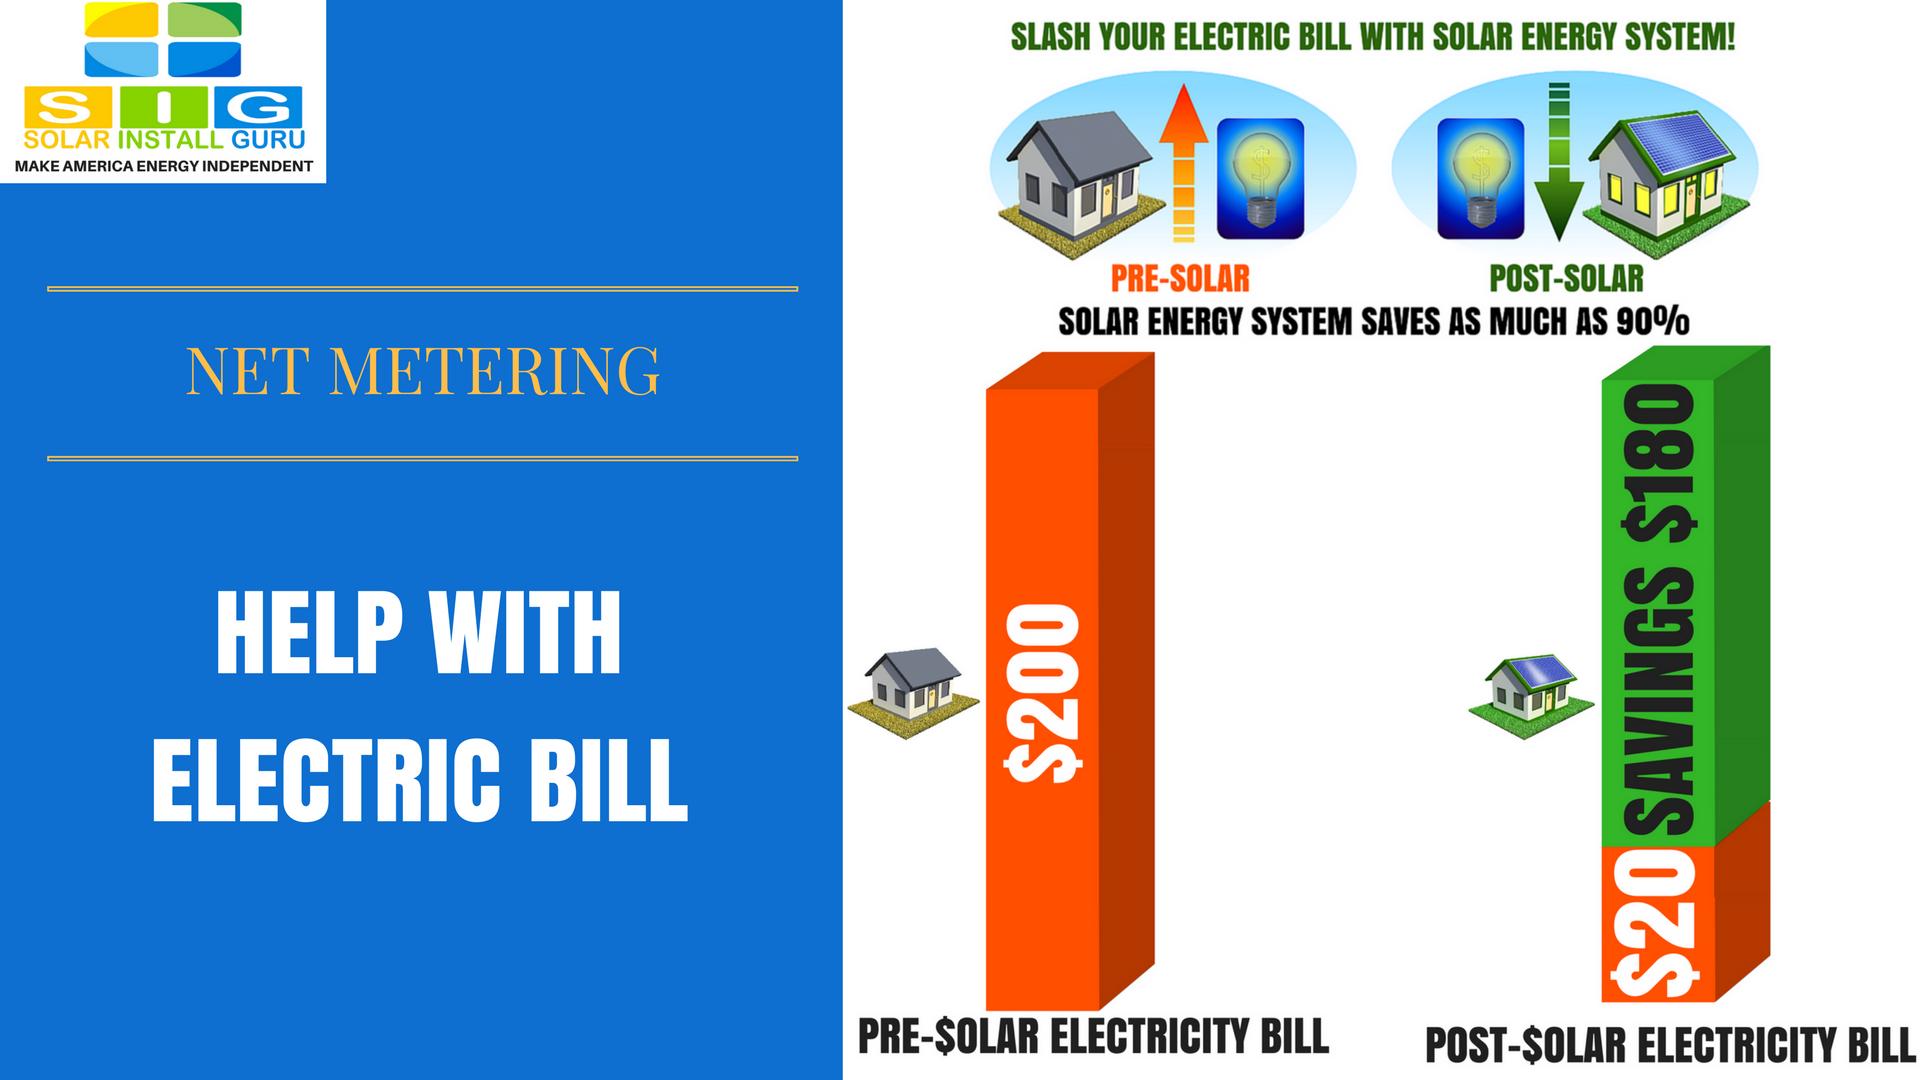 help with electric bill and net metering - solarinstallguru